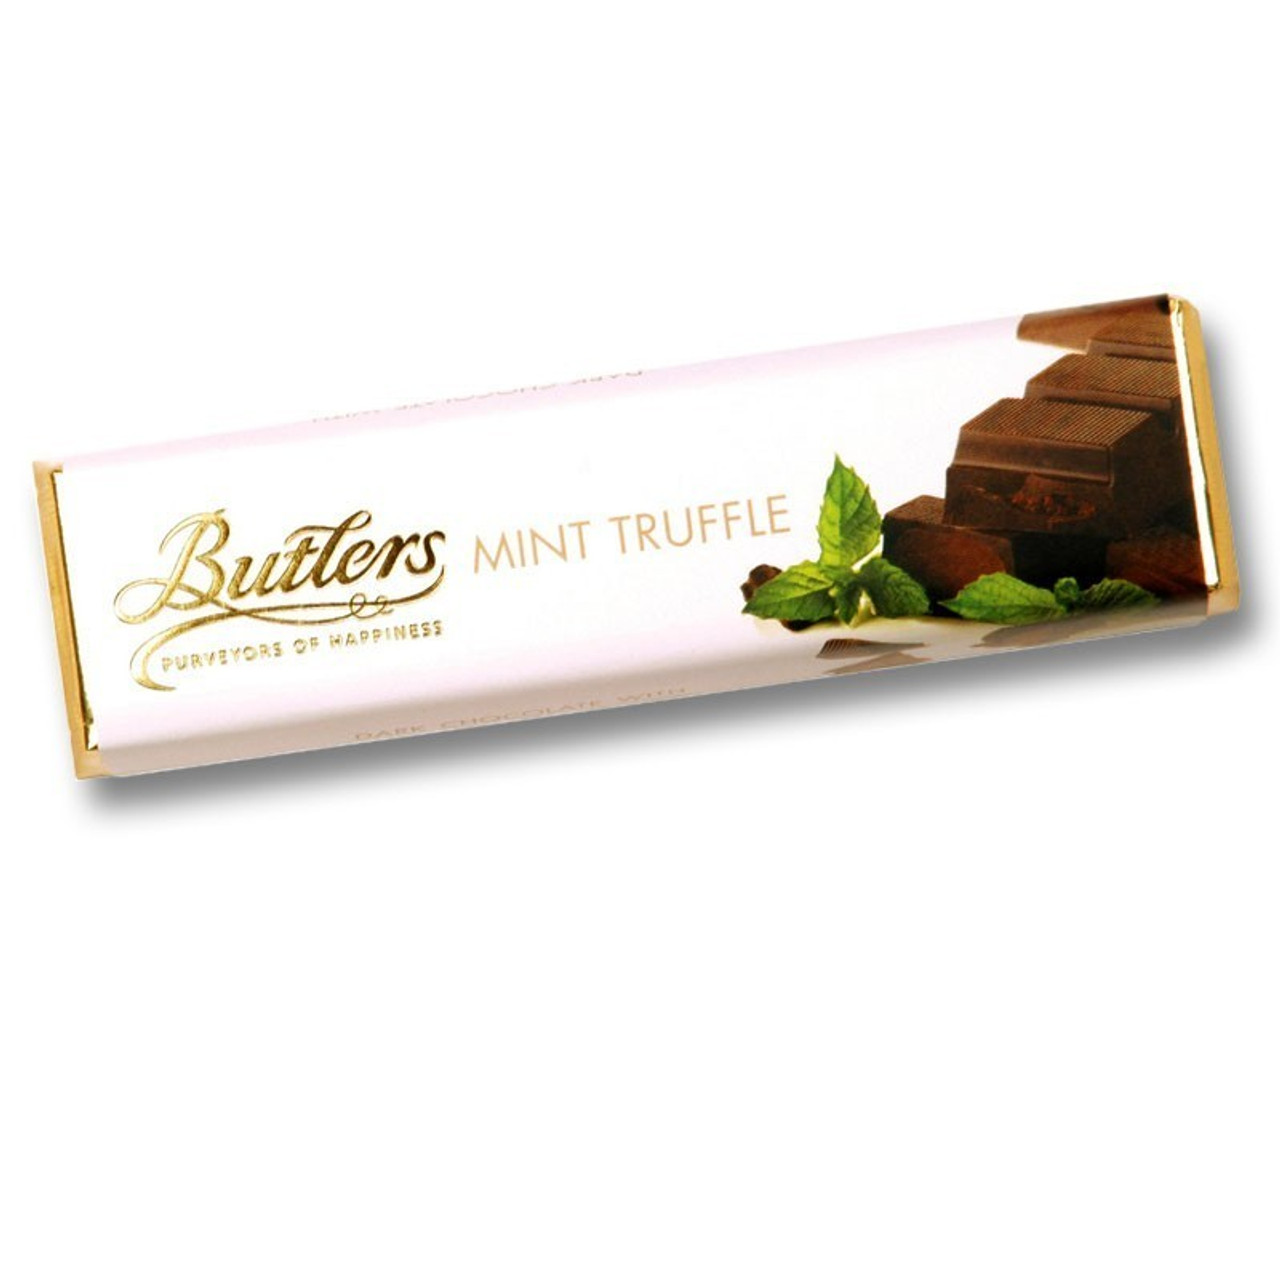 Butler's Mint Truffle Bar Dark Chocholate